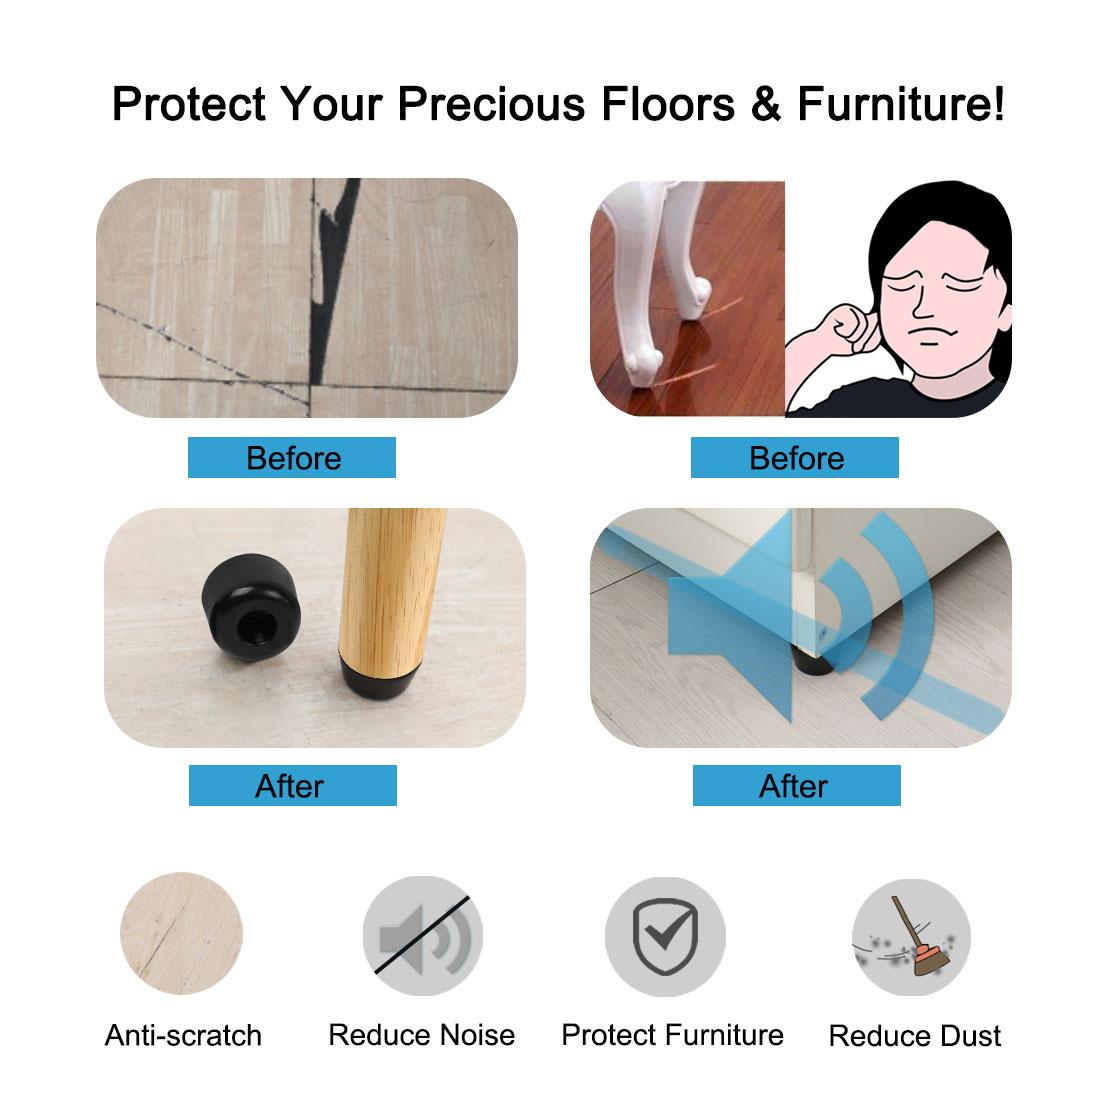 60pcs Rubber Feet Bumper Speaker Floor Protector Table Leg Pads, D19x15xH10.5mm - image 5 de 7